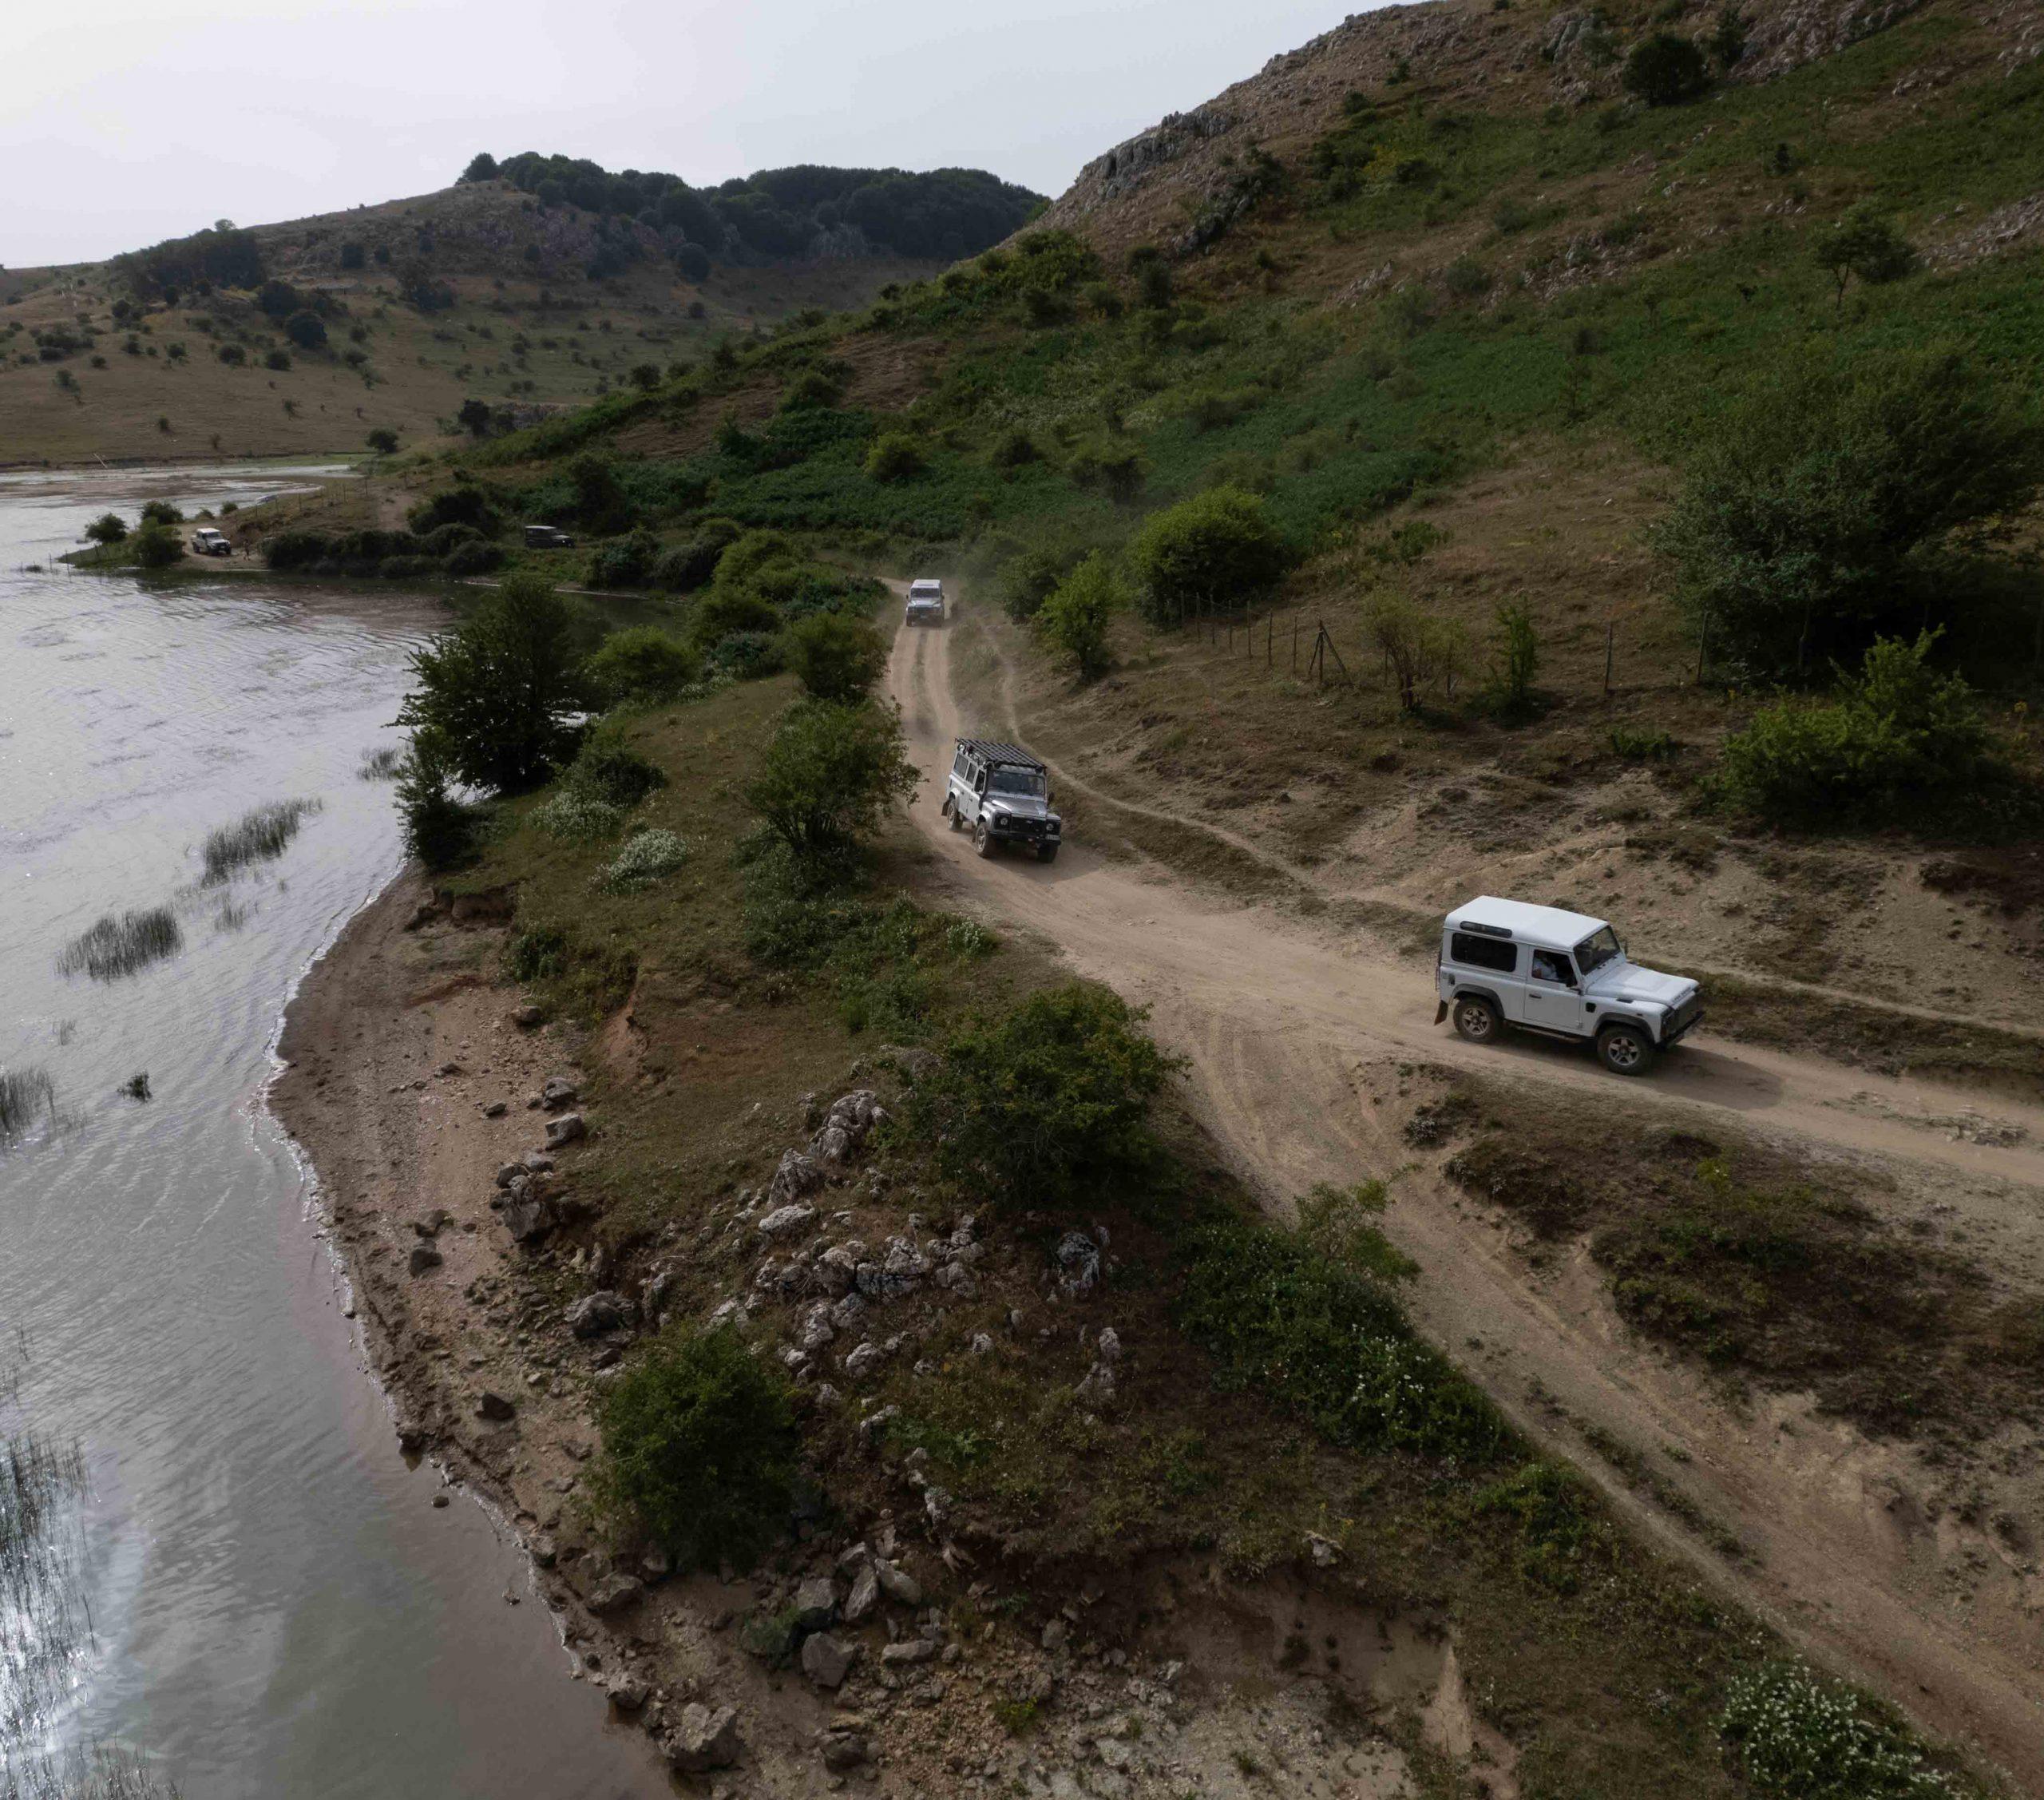 Land_Rover_Tour_Sicilia_2021_Land_Rover_Experience_Italia_-83